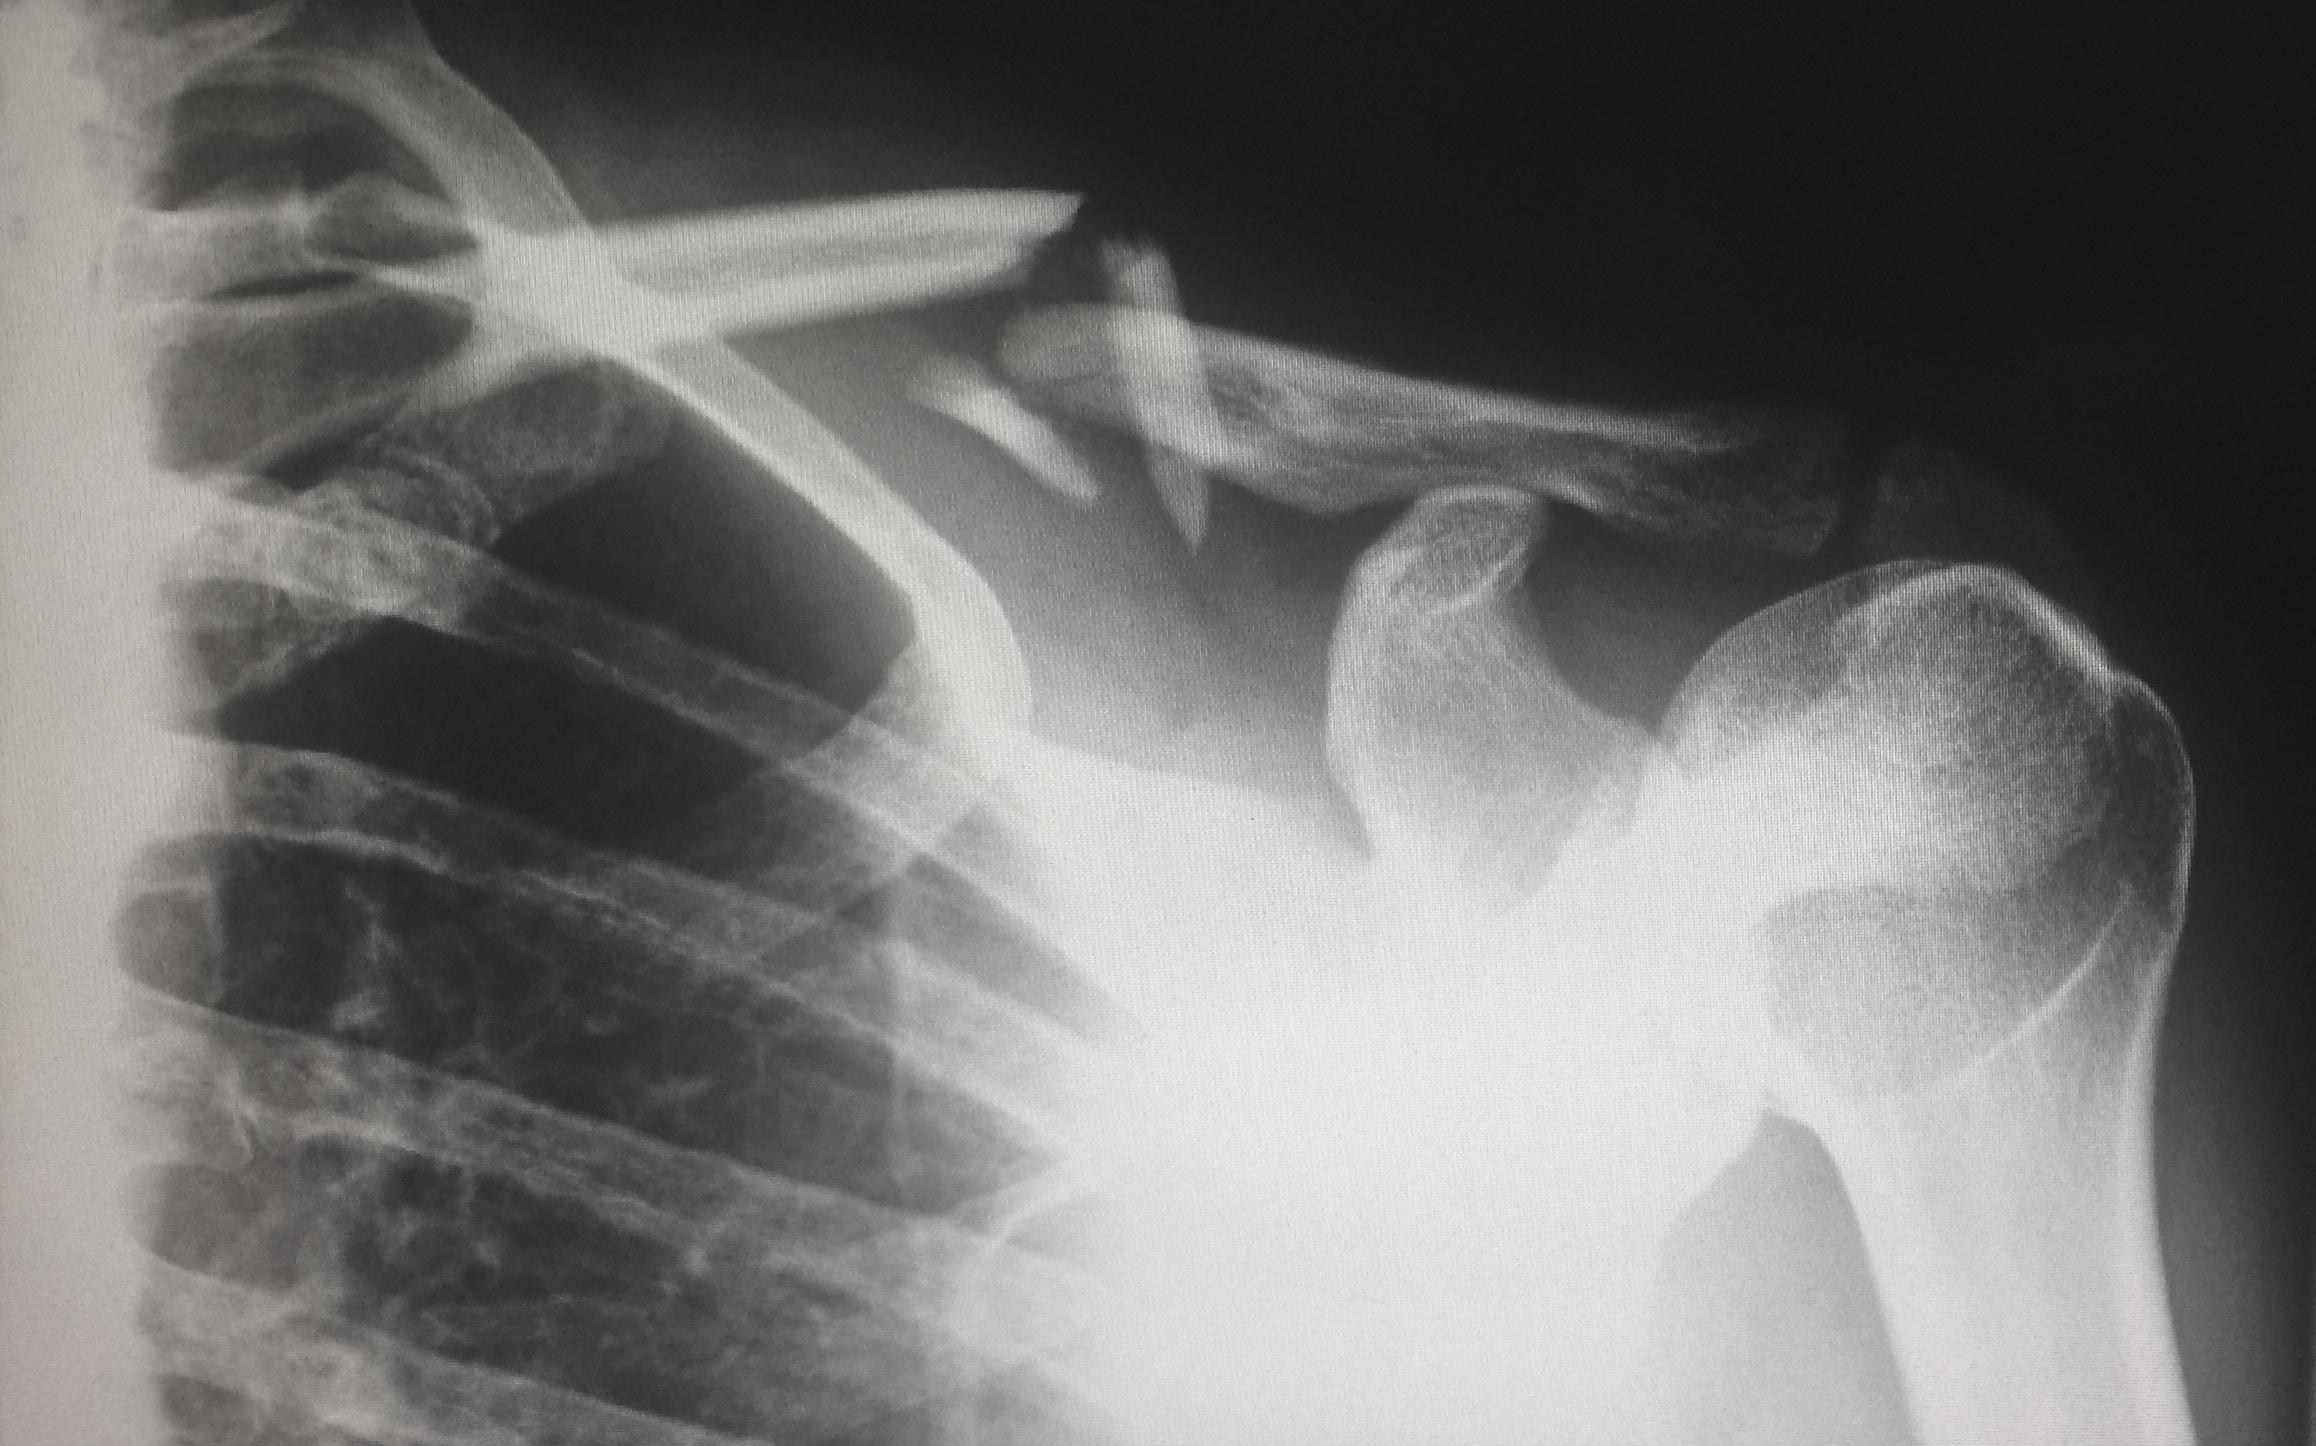 Injuries & Surgery